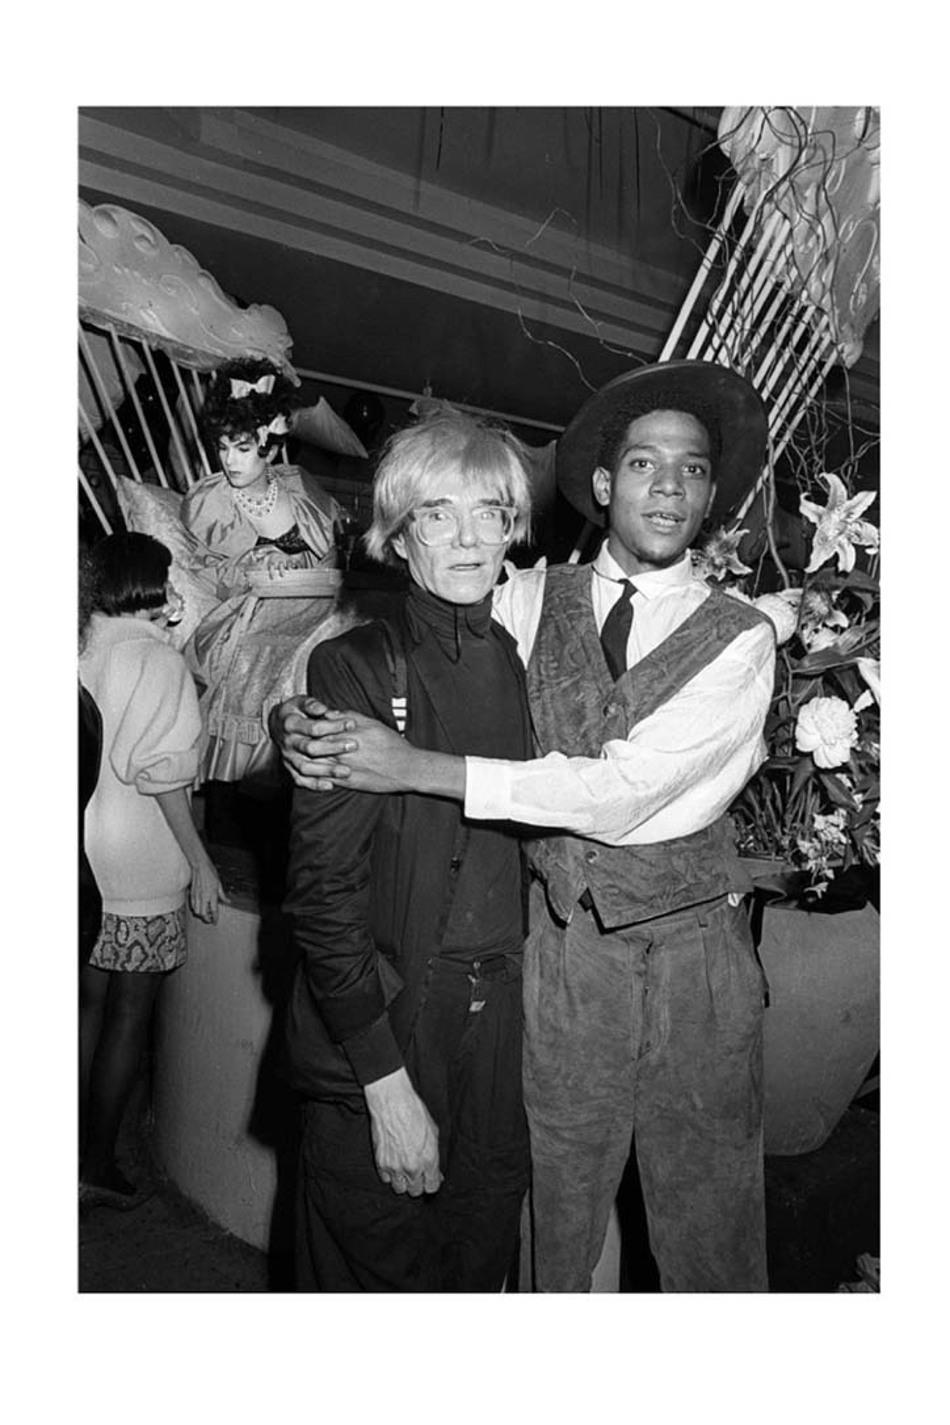 Andy_Warhol___Jean_Michel_Basquiat_15x10